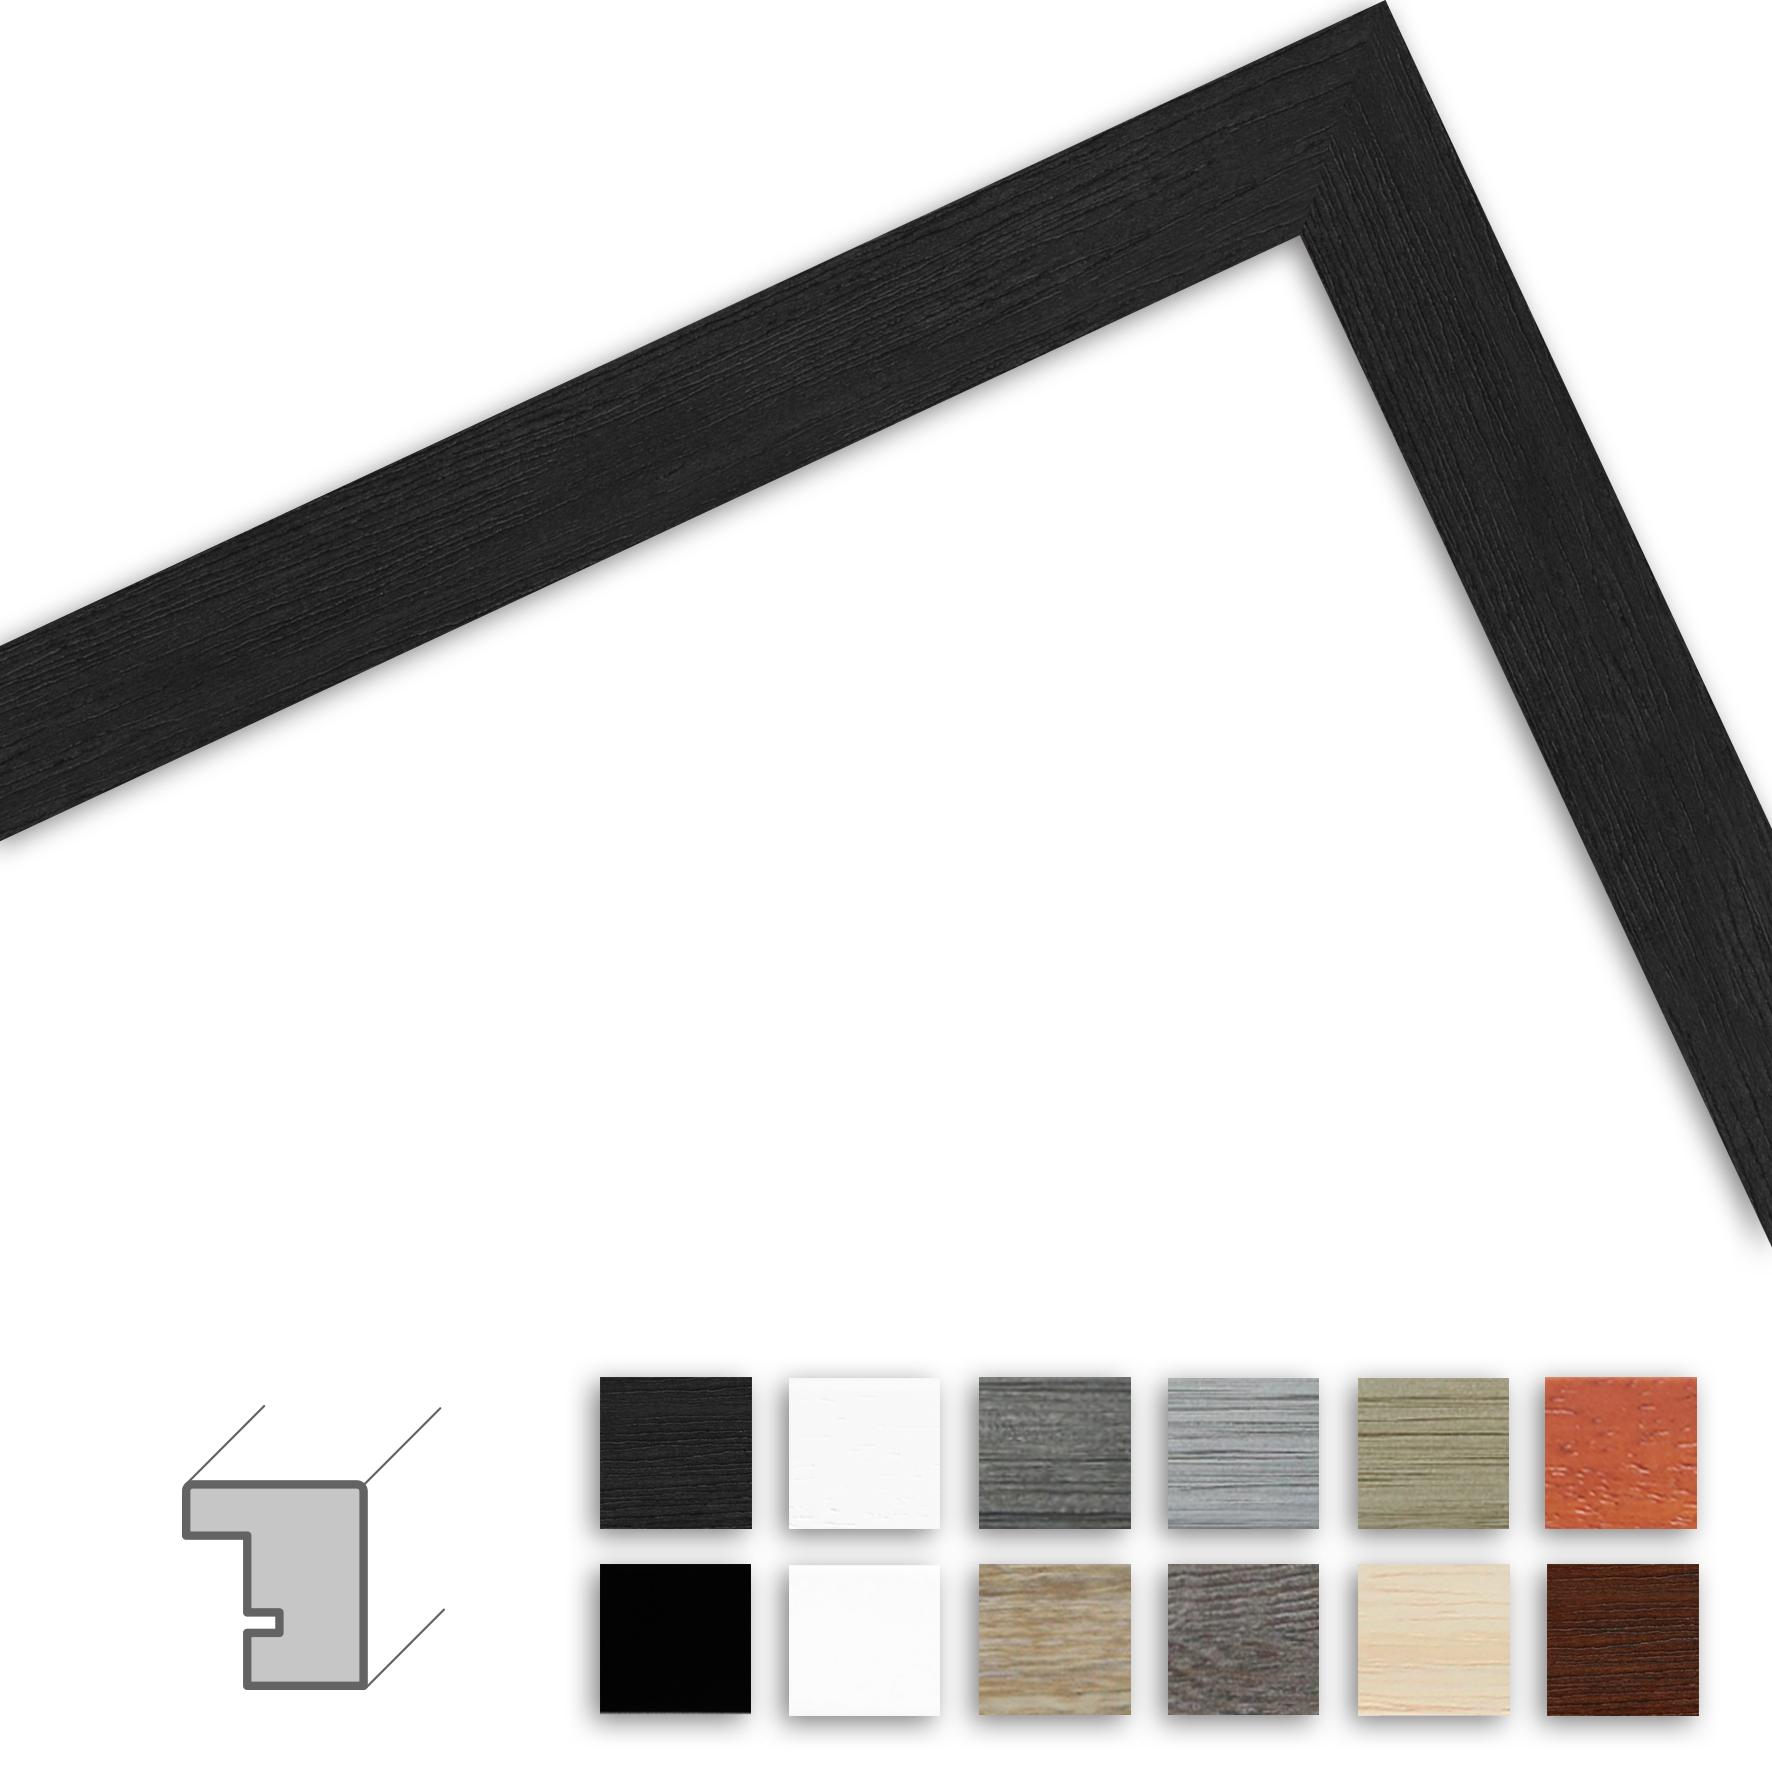 klassische bilderrahmen bilderrahmen. Black Bedroom Furniture Sets. Home Design Ideas